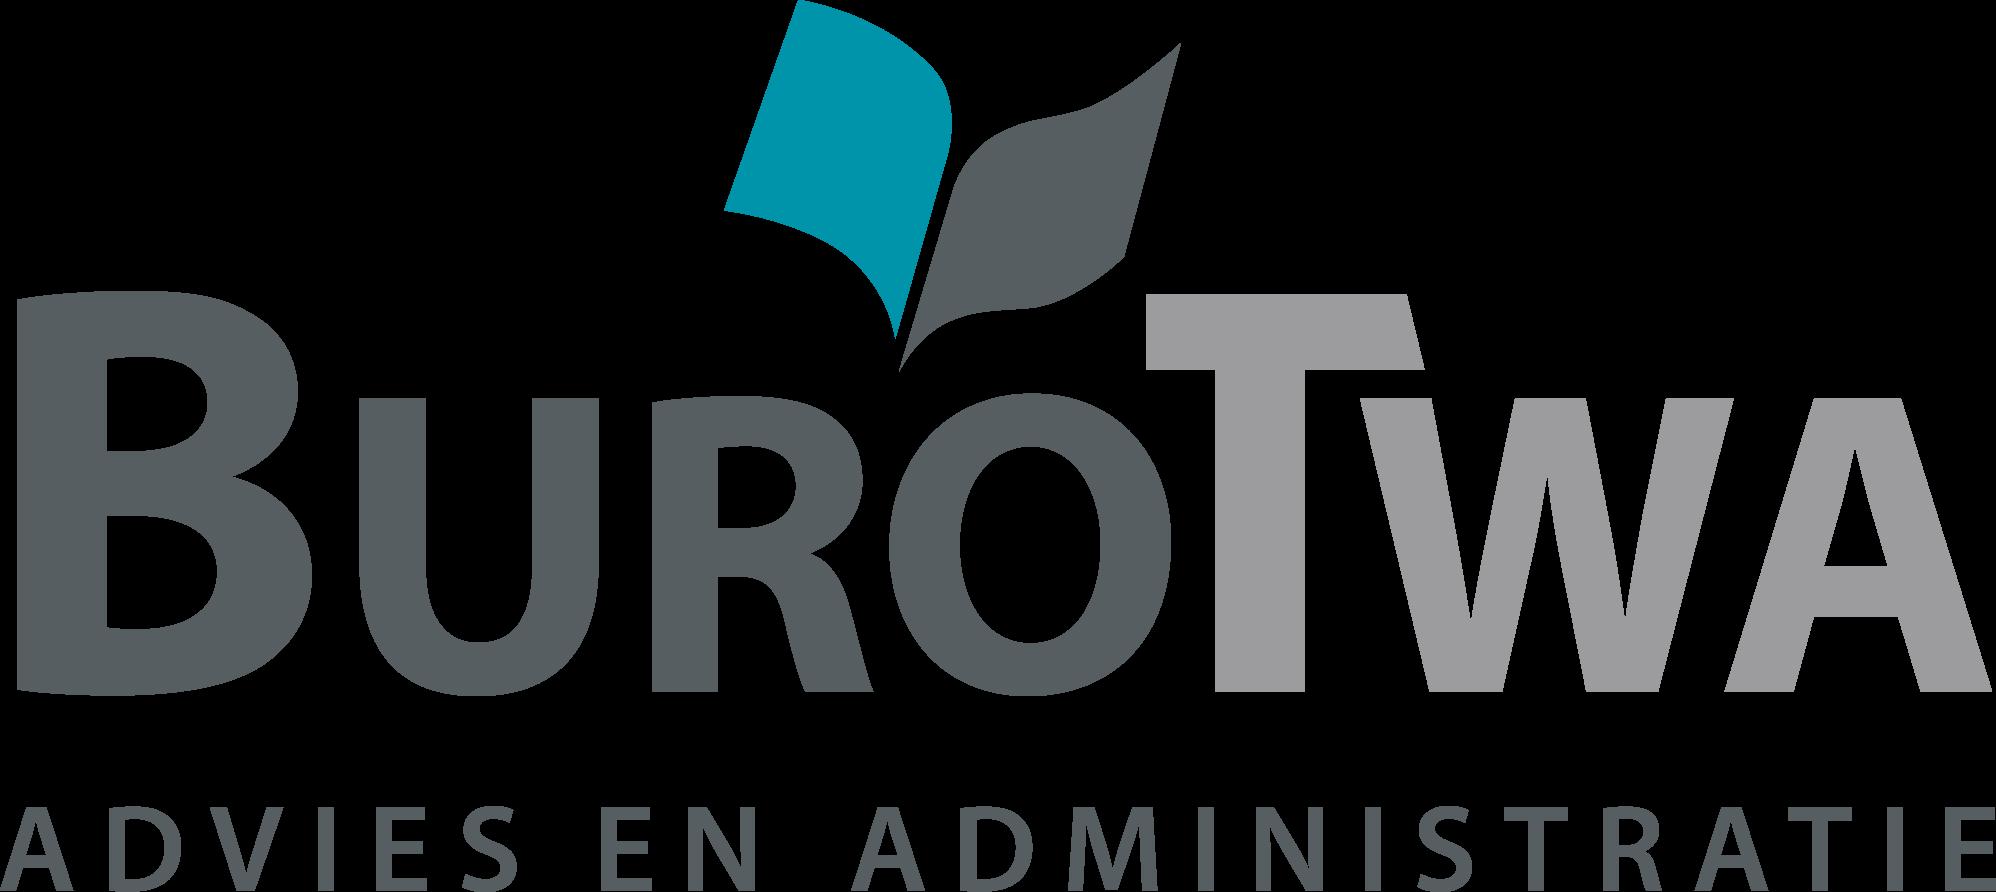 Logo Burotwa